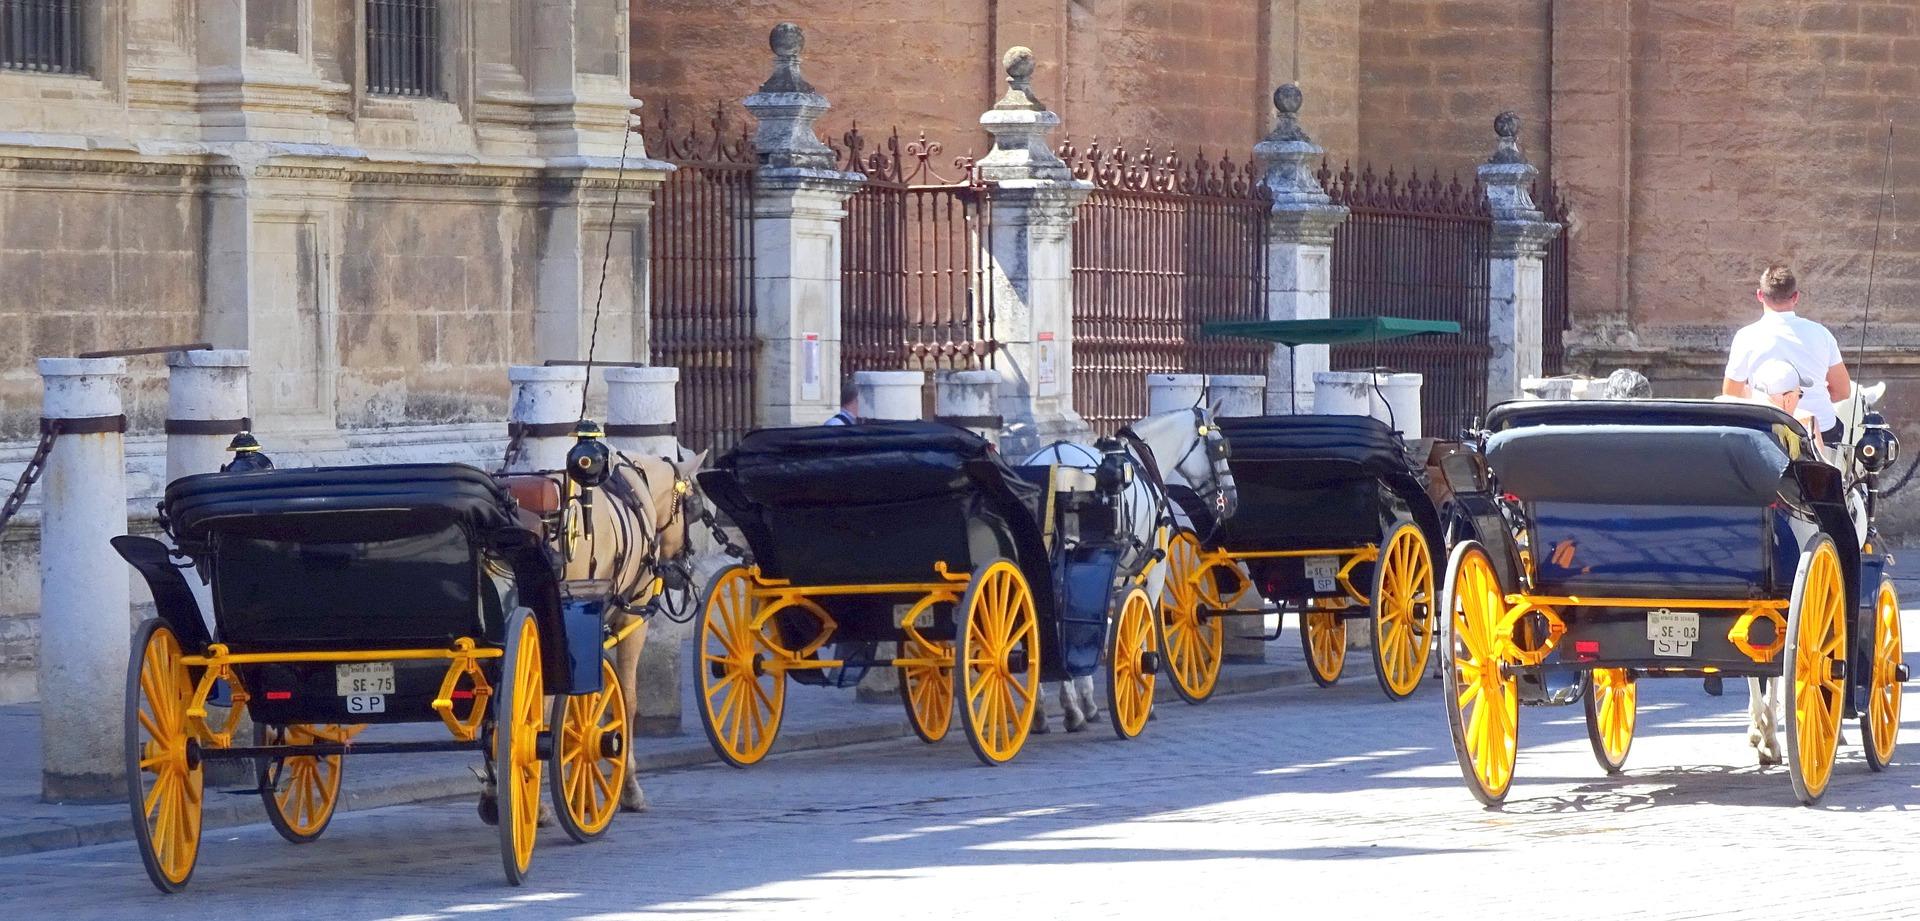 Feria-de-seville-seminaire